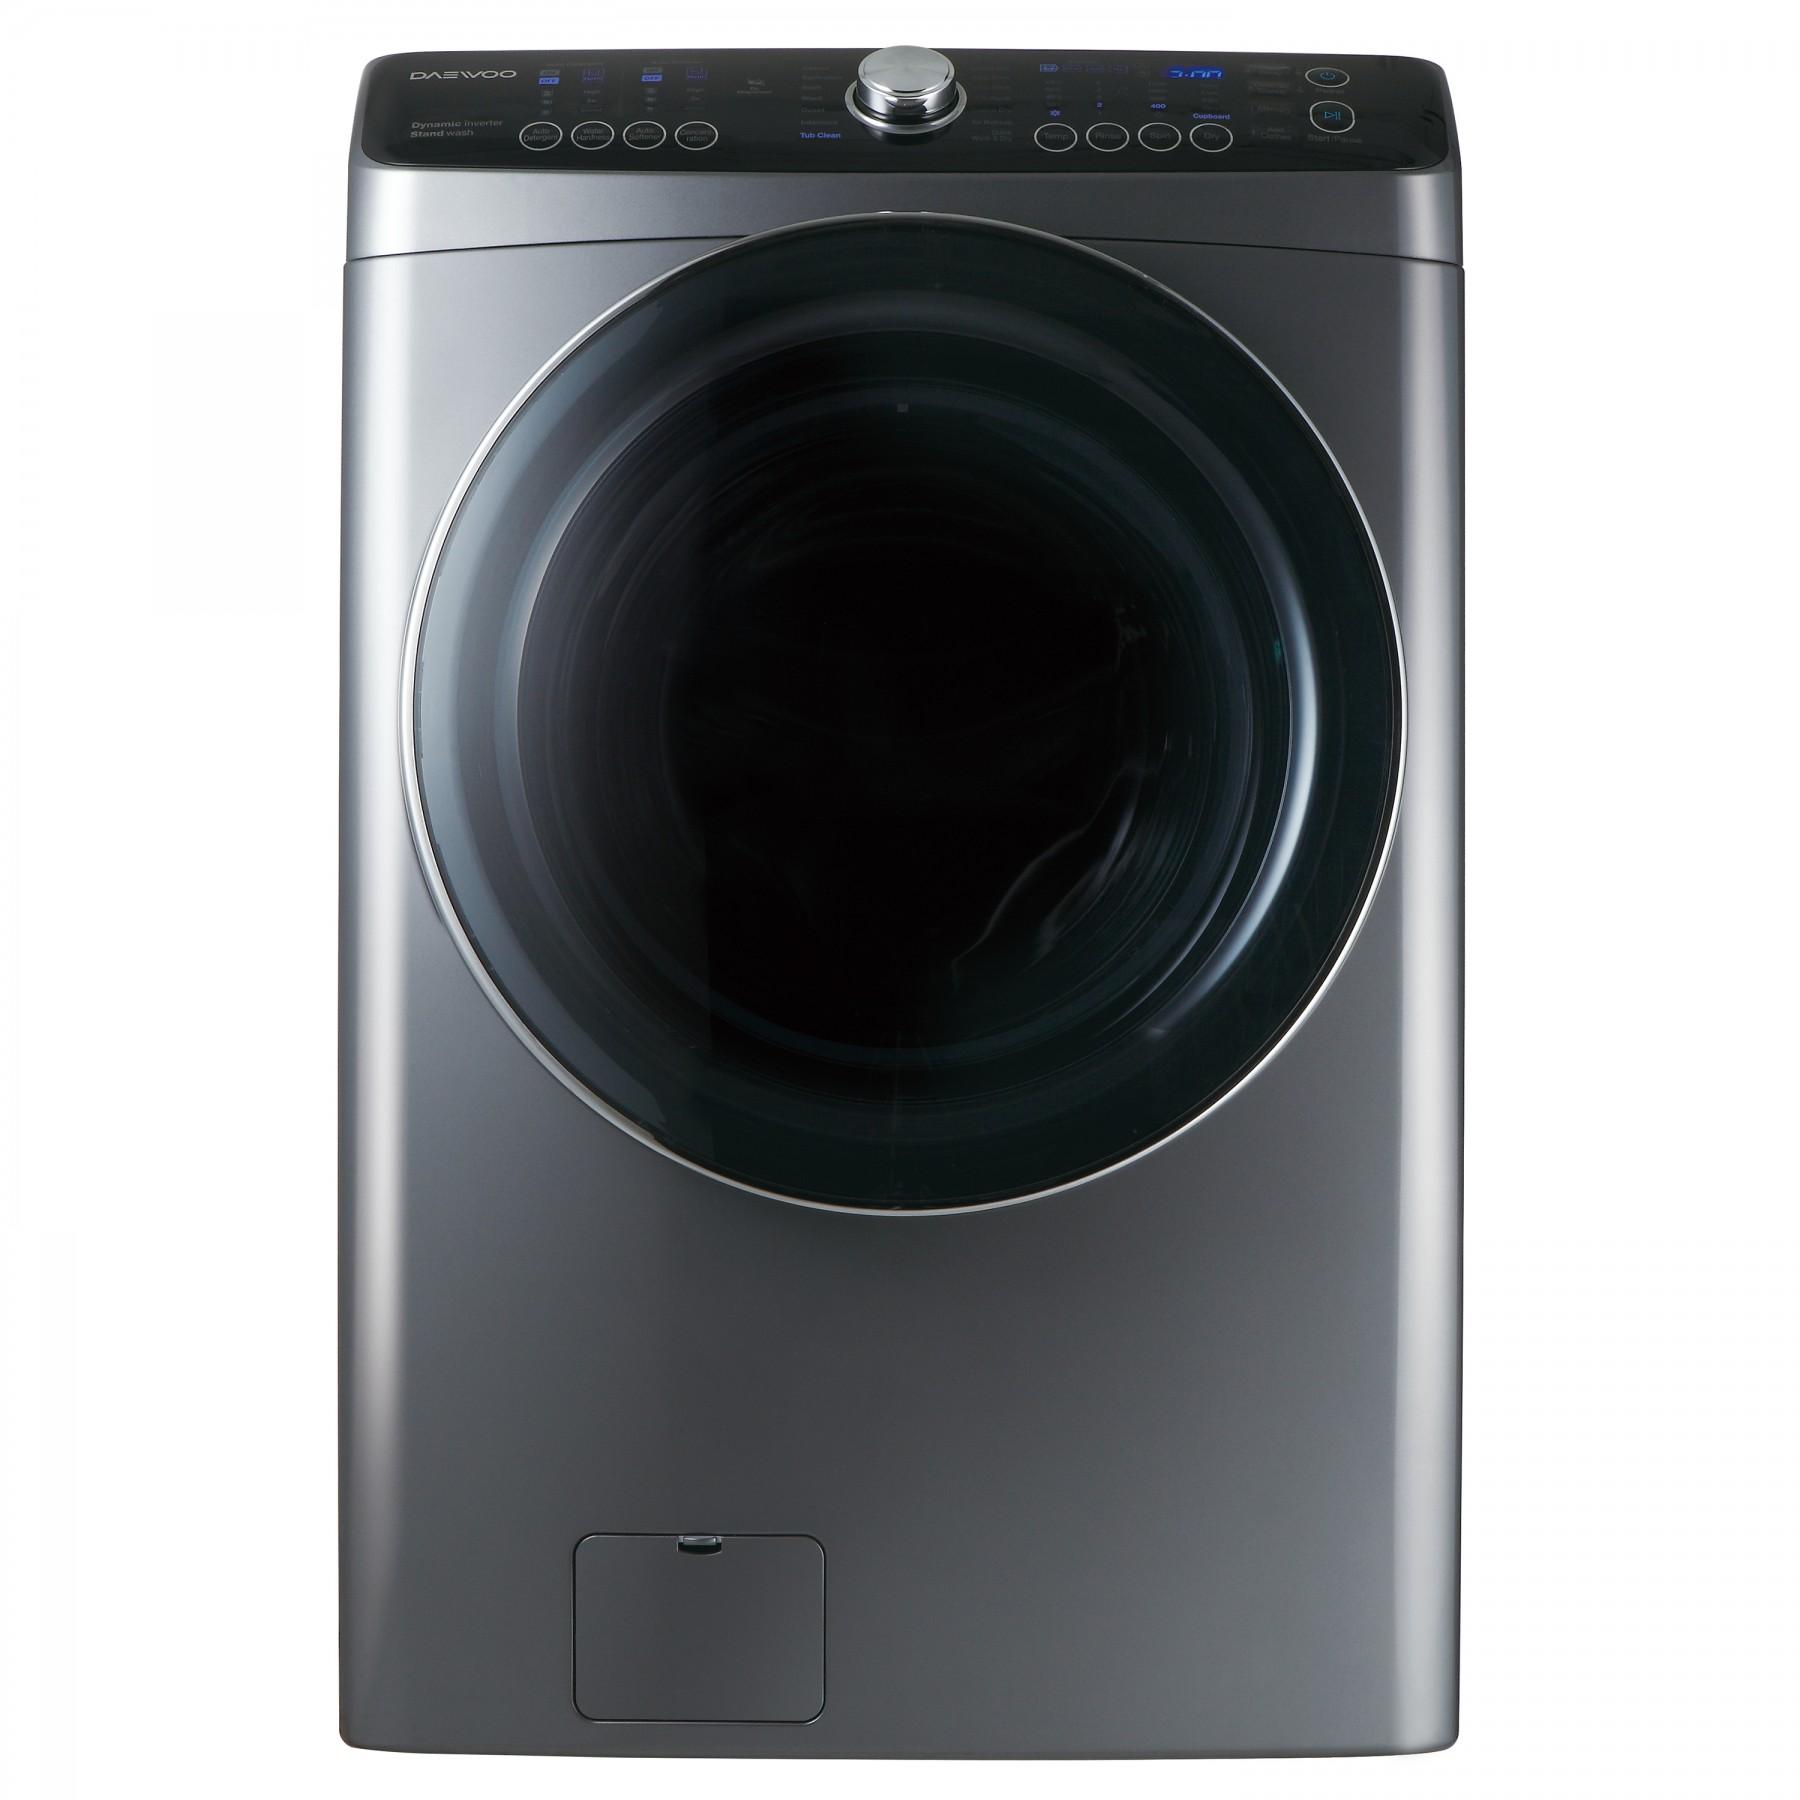 Dwc Pd1213 Washer Dryer 12 8kg 1200rpm Daewoo Electronics